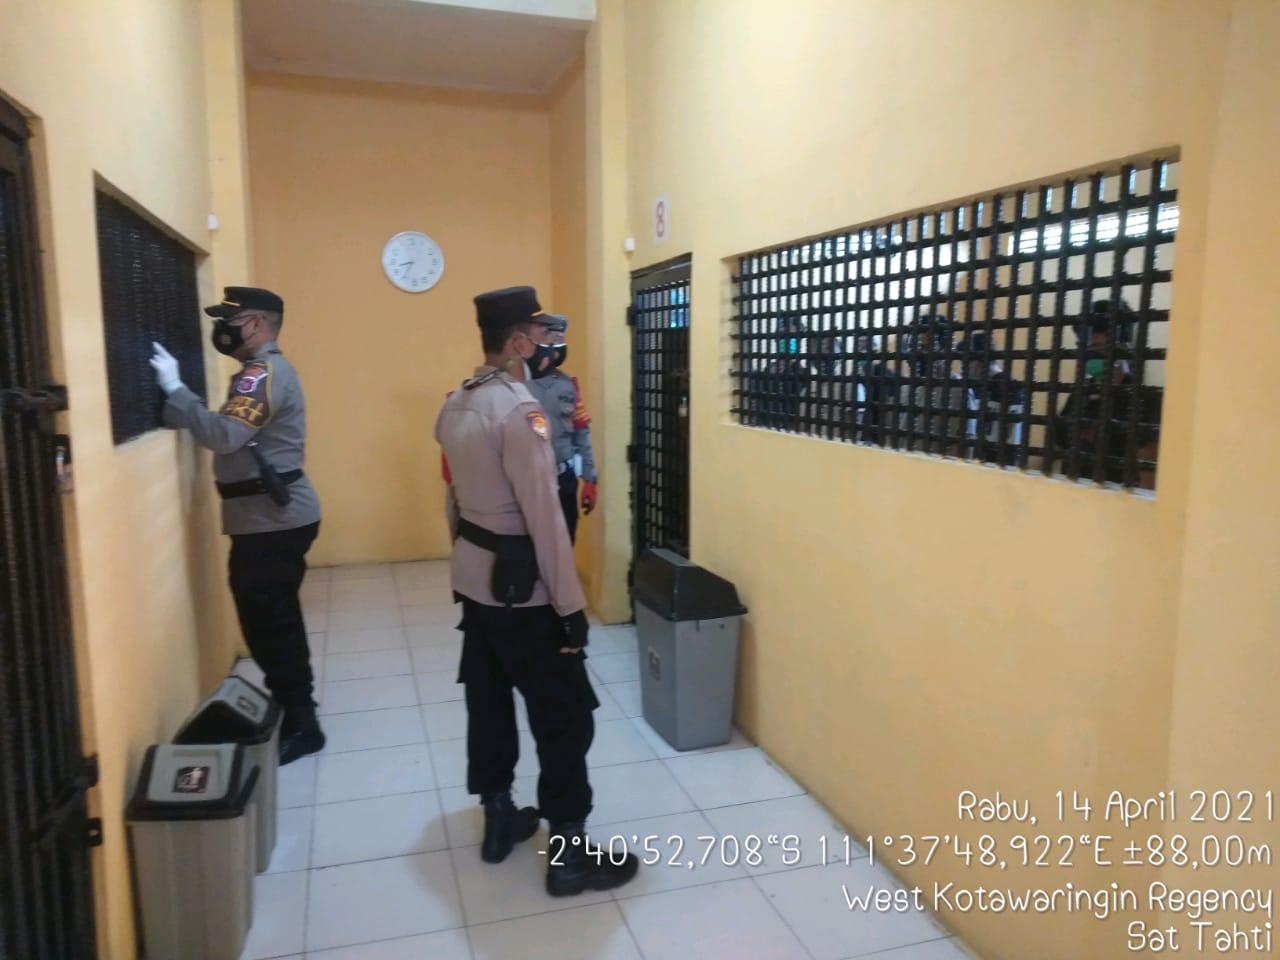 Personel Satsabhara Polres Kotawaringin Barat laksanakan pemeriksaan